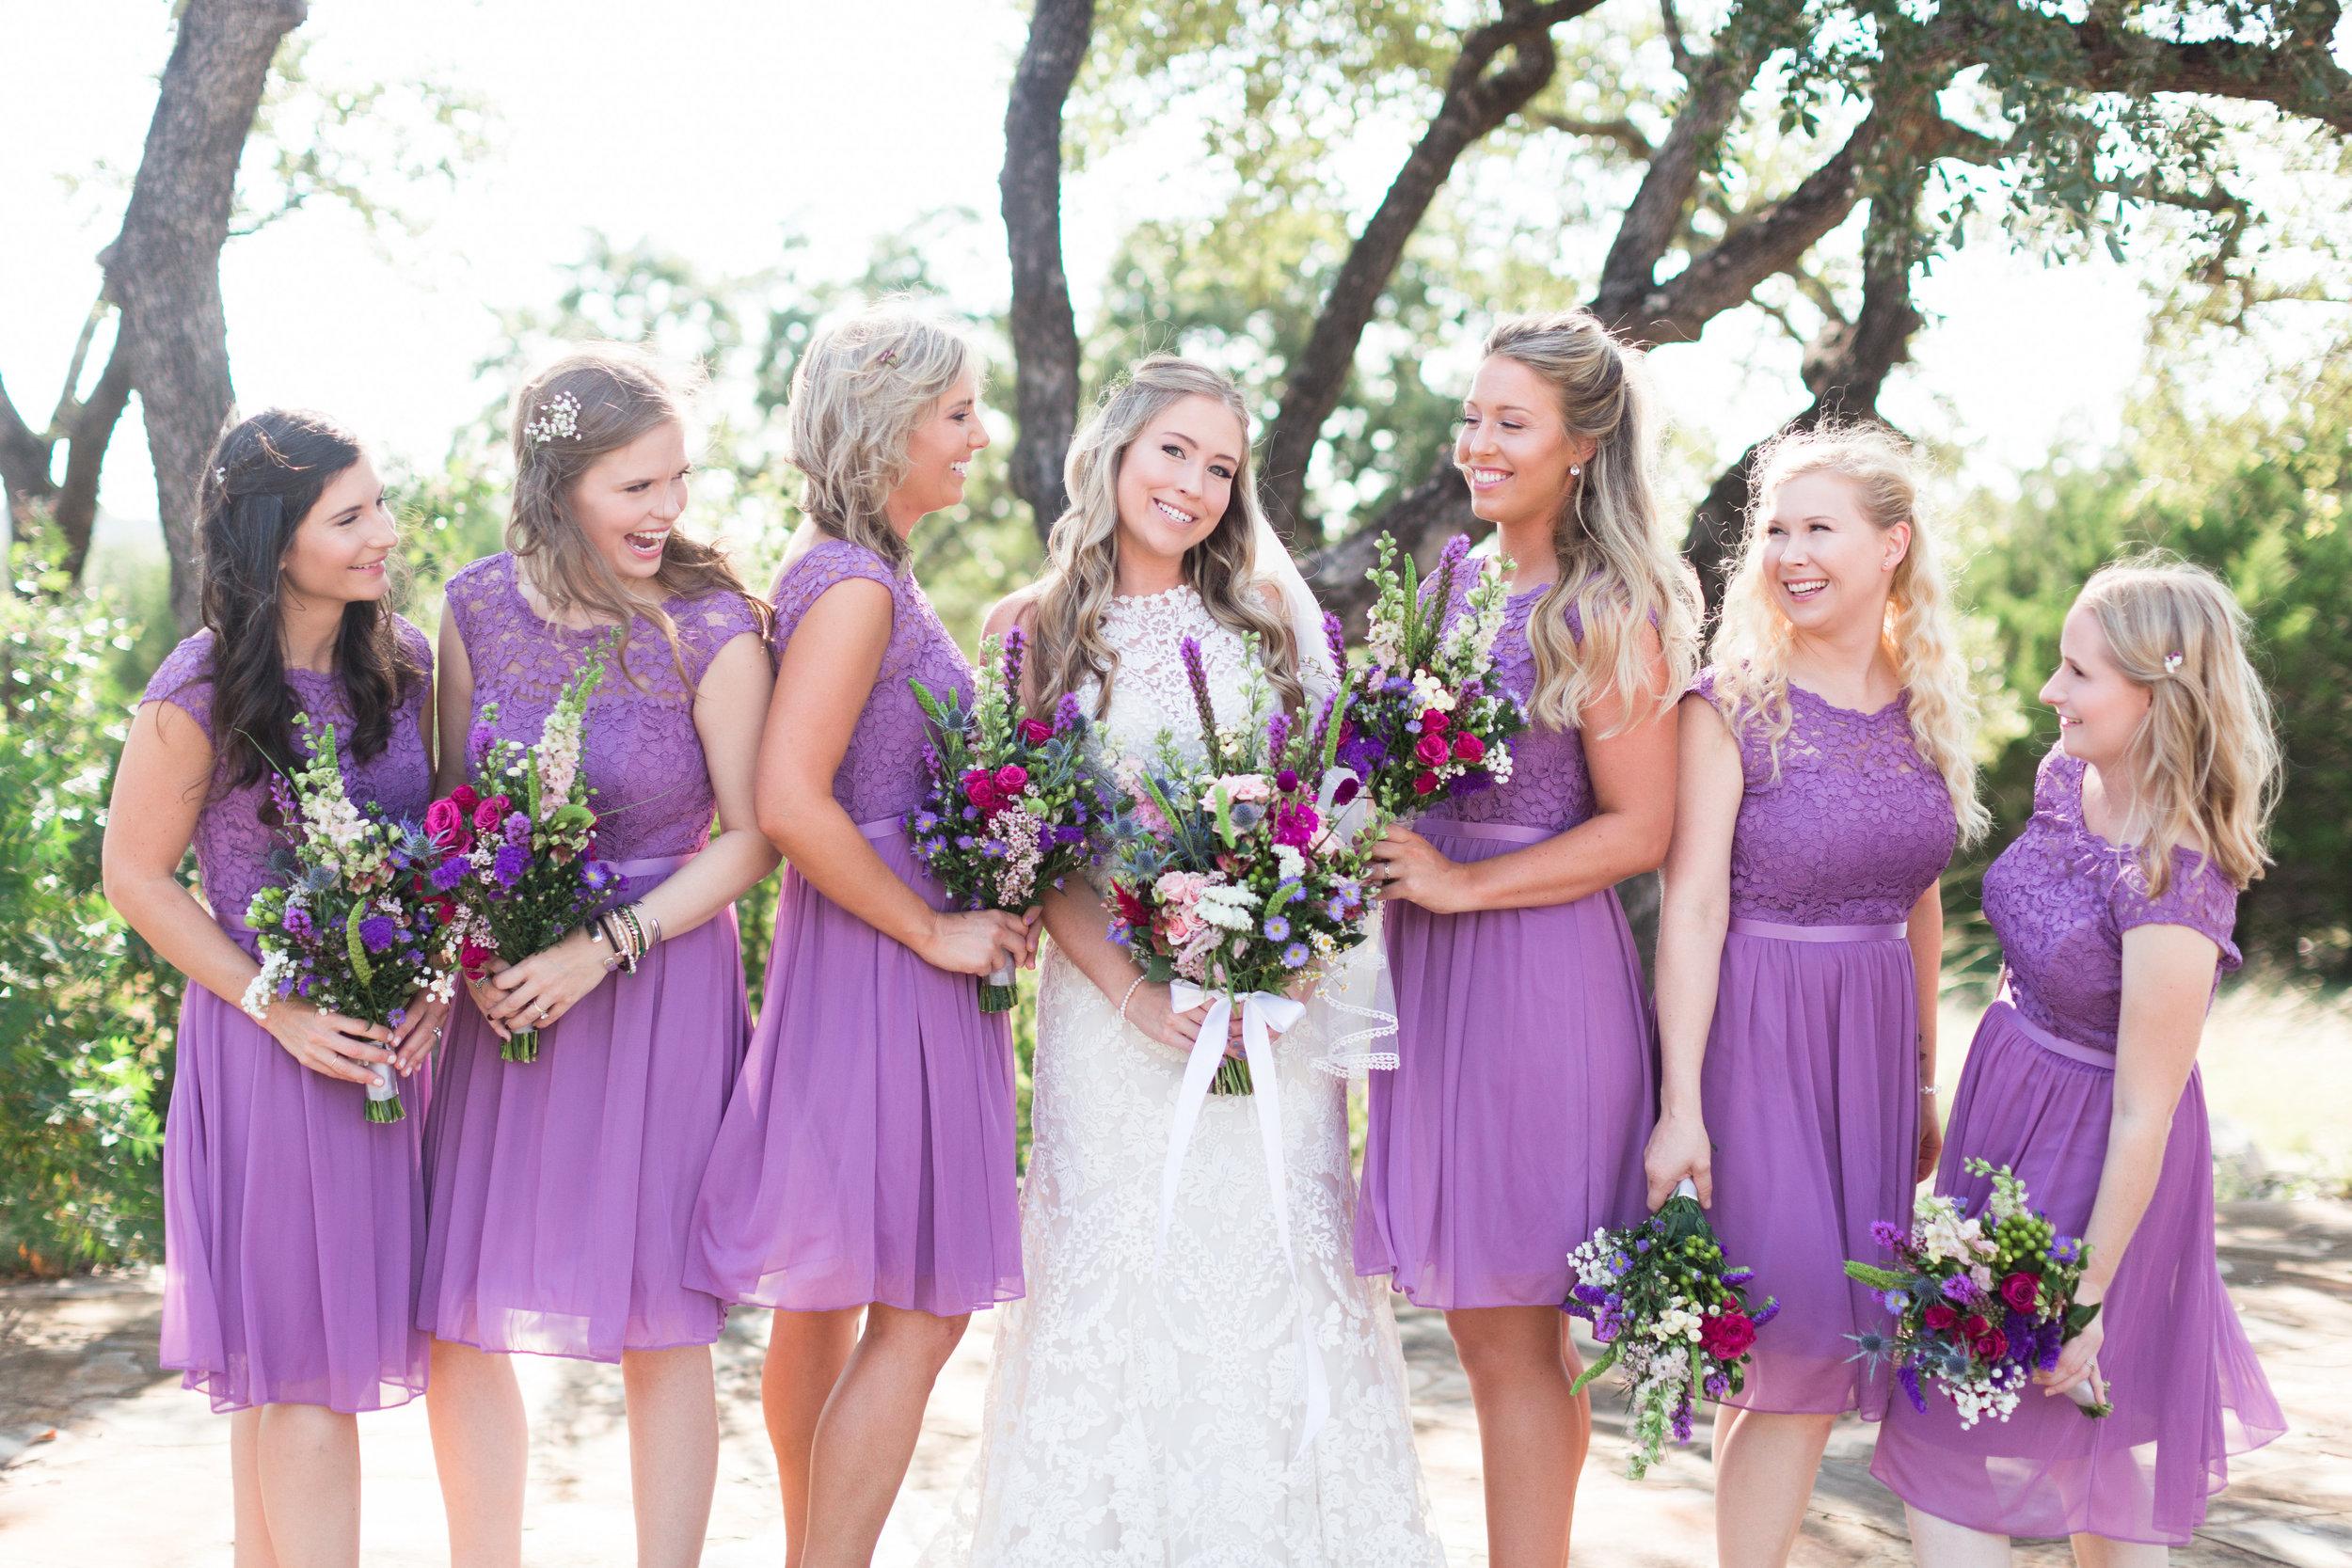 Lace Wedding Dress - Purple Bridesmaid Dresses - Heritage House Wedding - Georgetown, Texas Wedding Venue